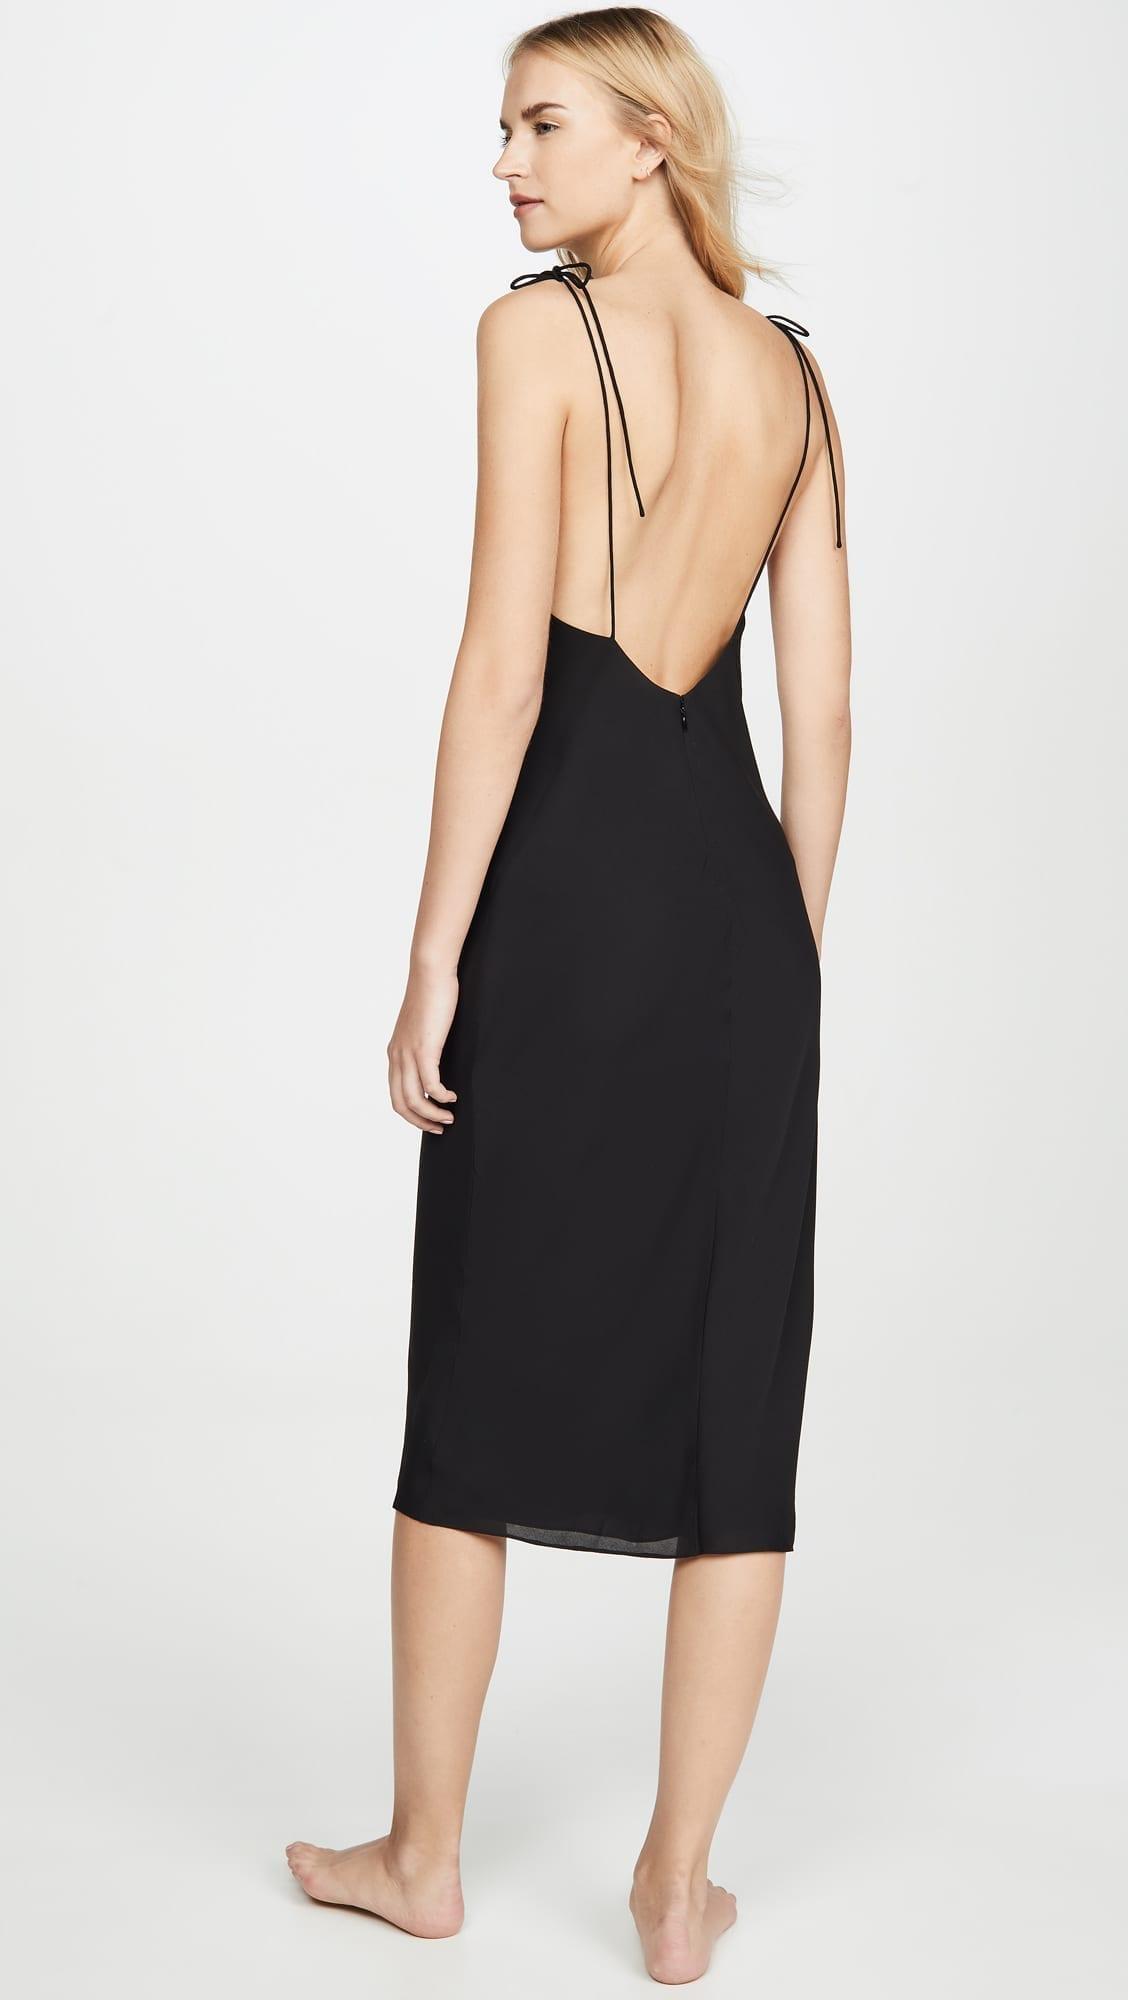 KIKI DE MONTPARNASSE Simple Slip Dress